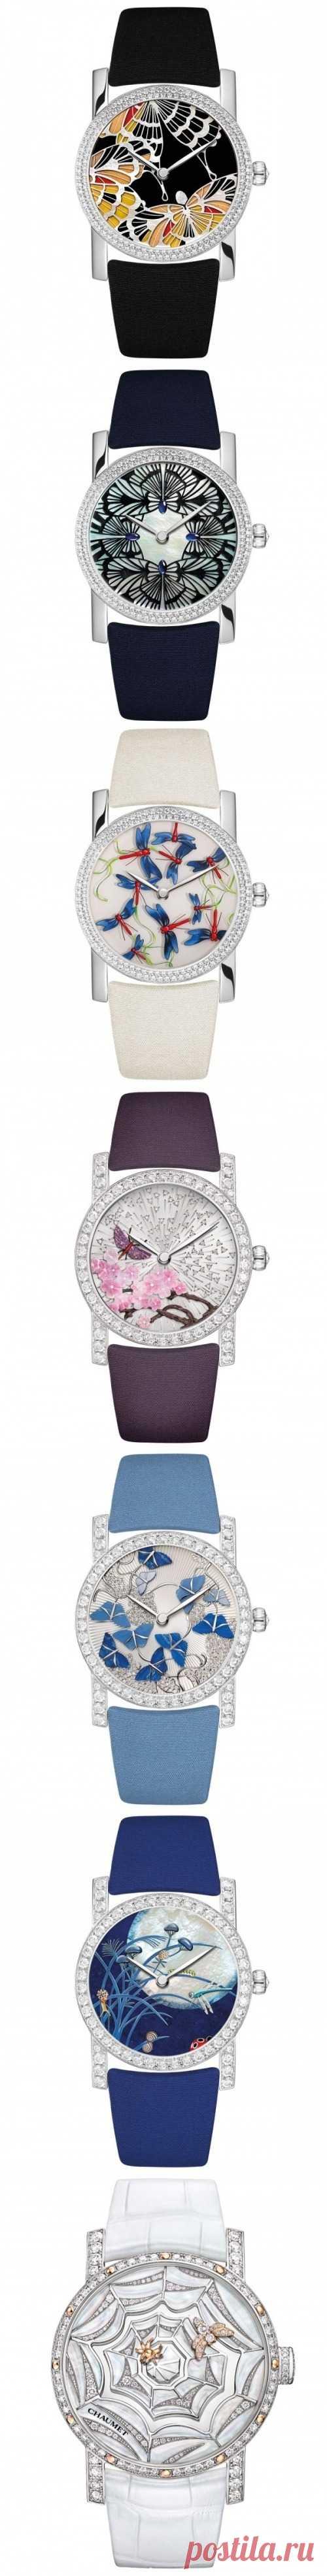 Ультрамодные часы от Chaumet